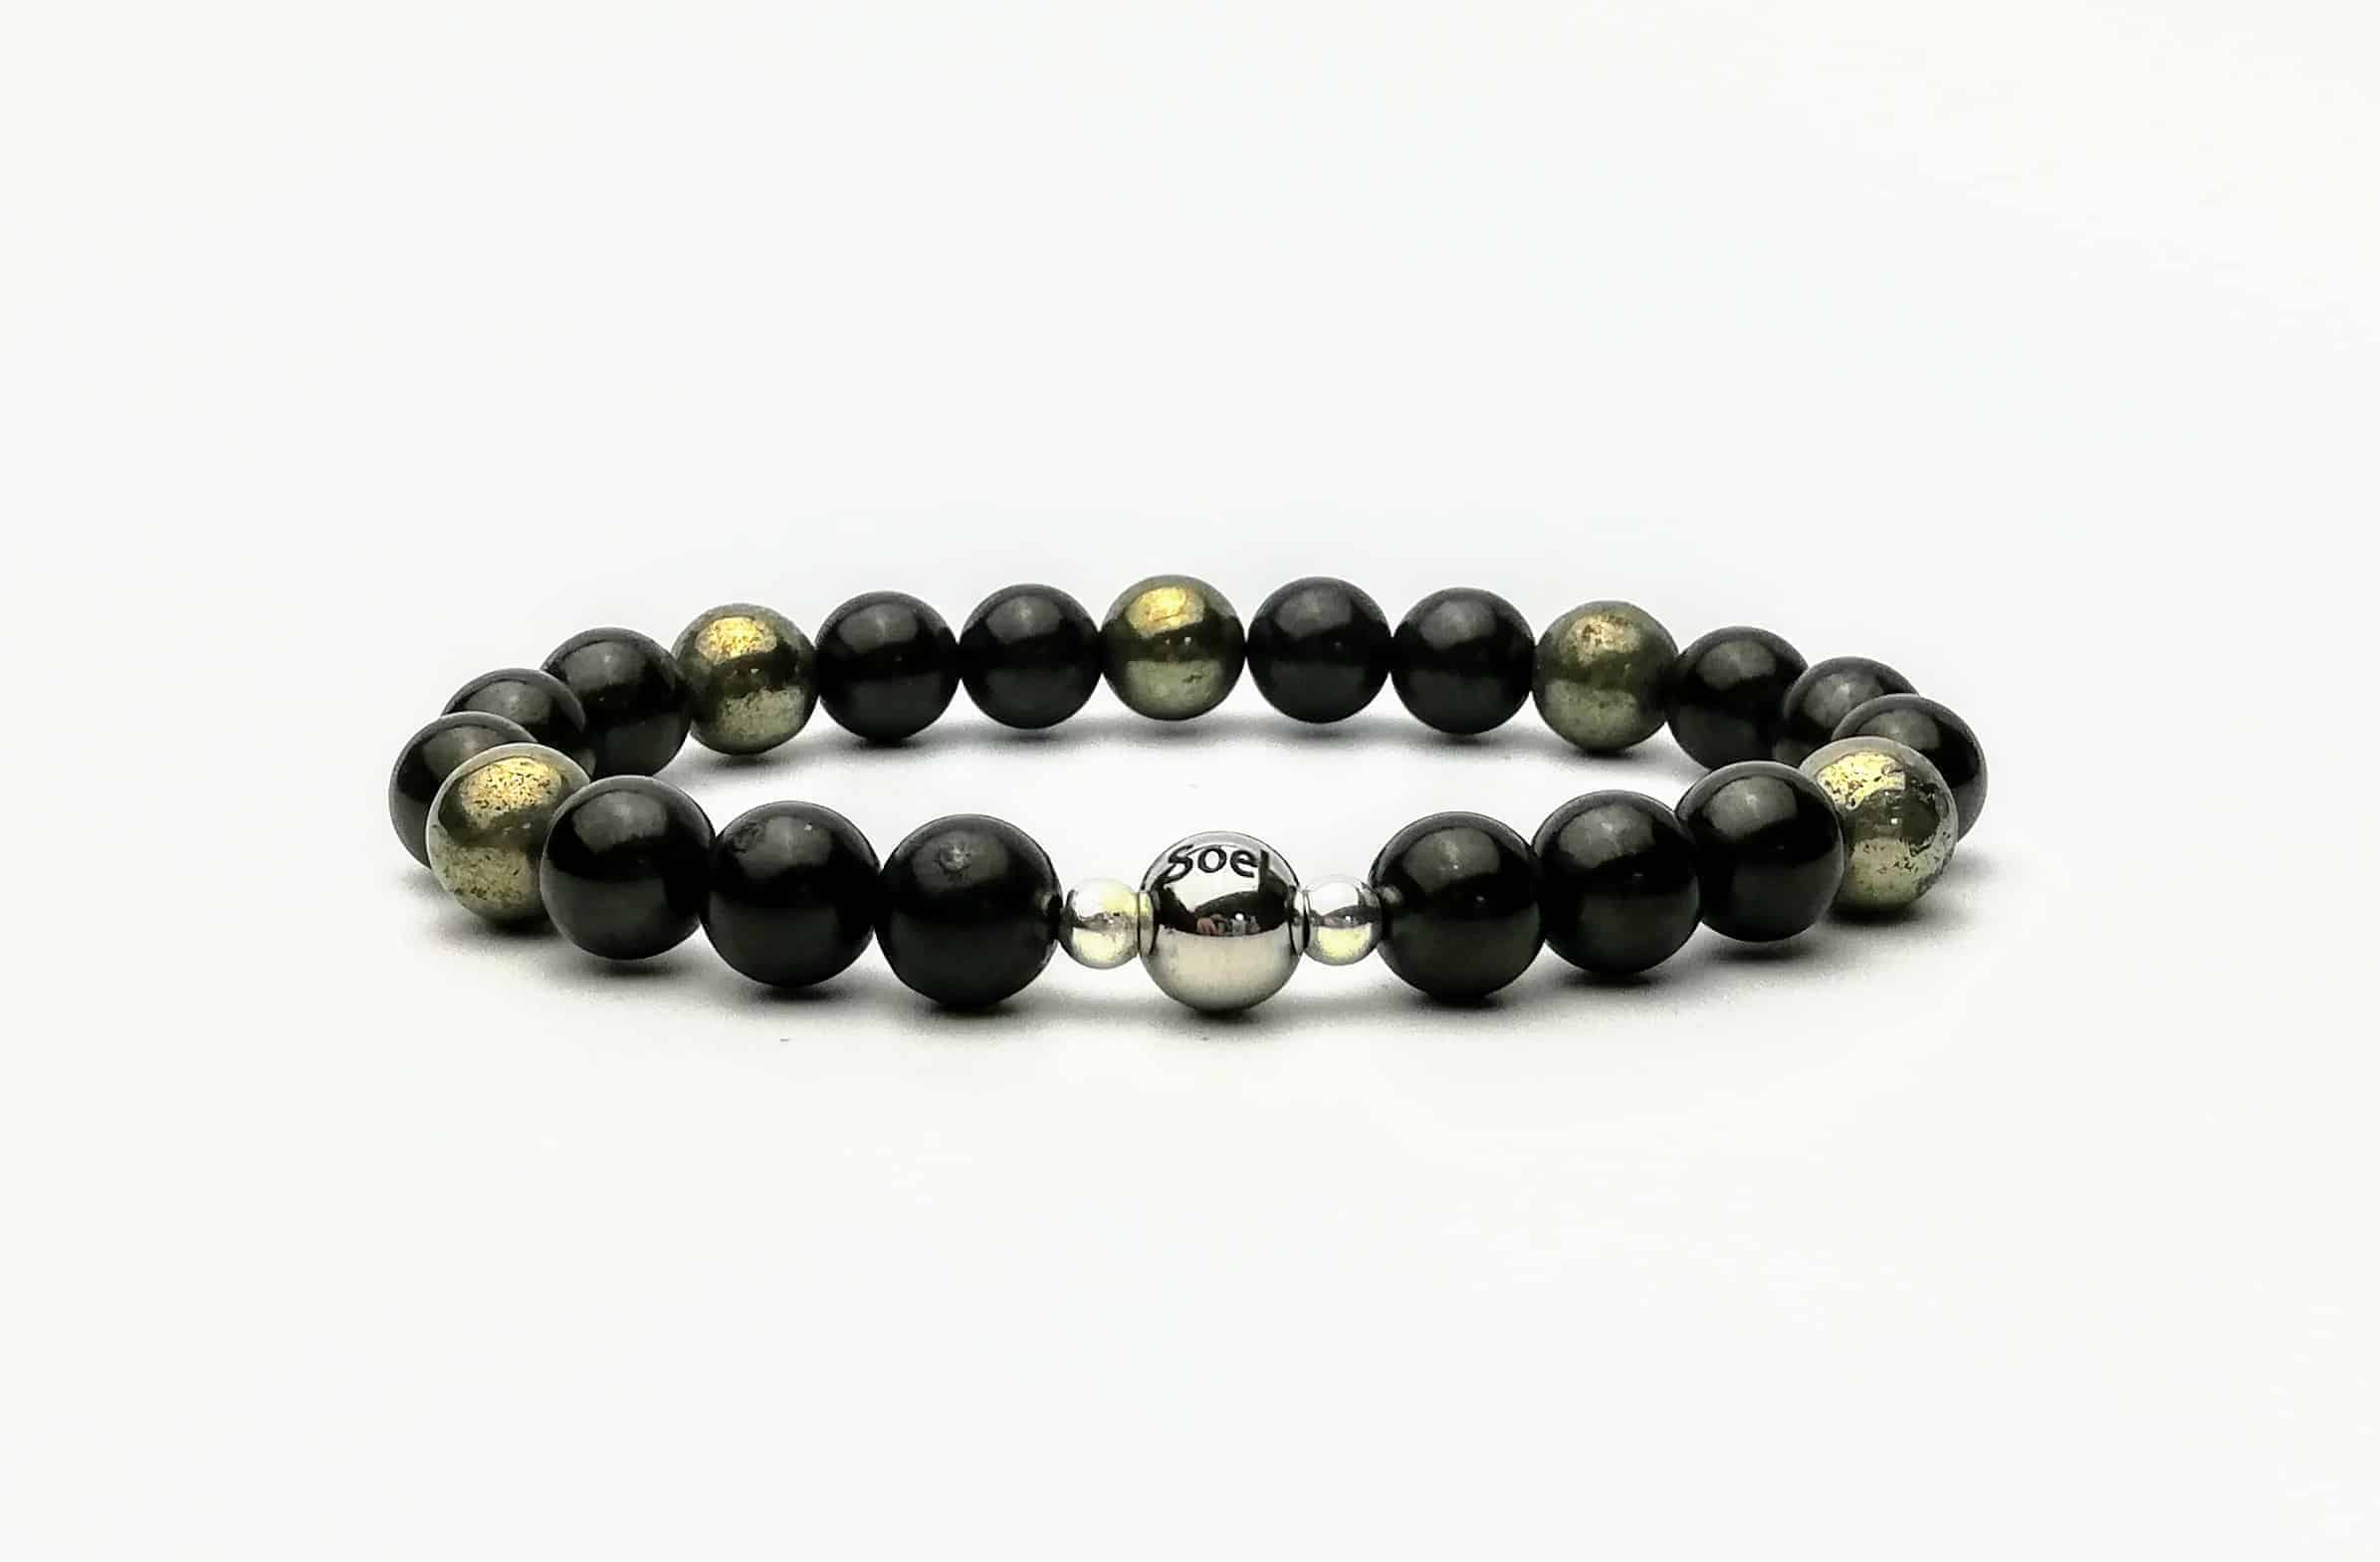 shungite and pyrite 8mm beaded bracelet